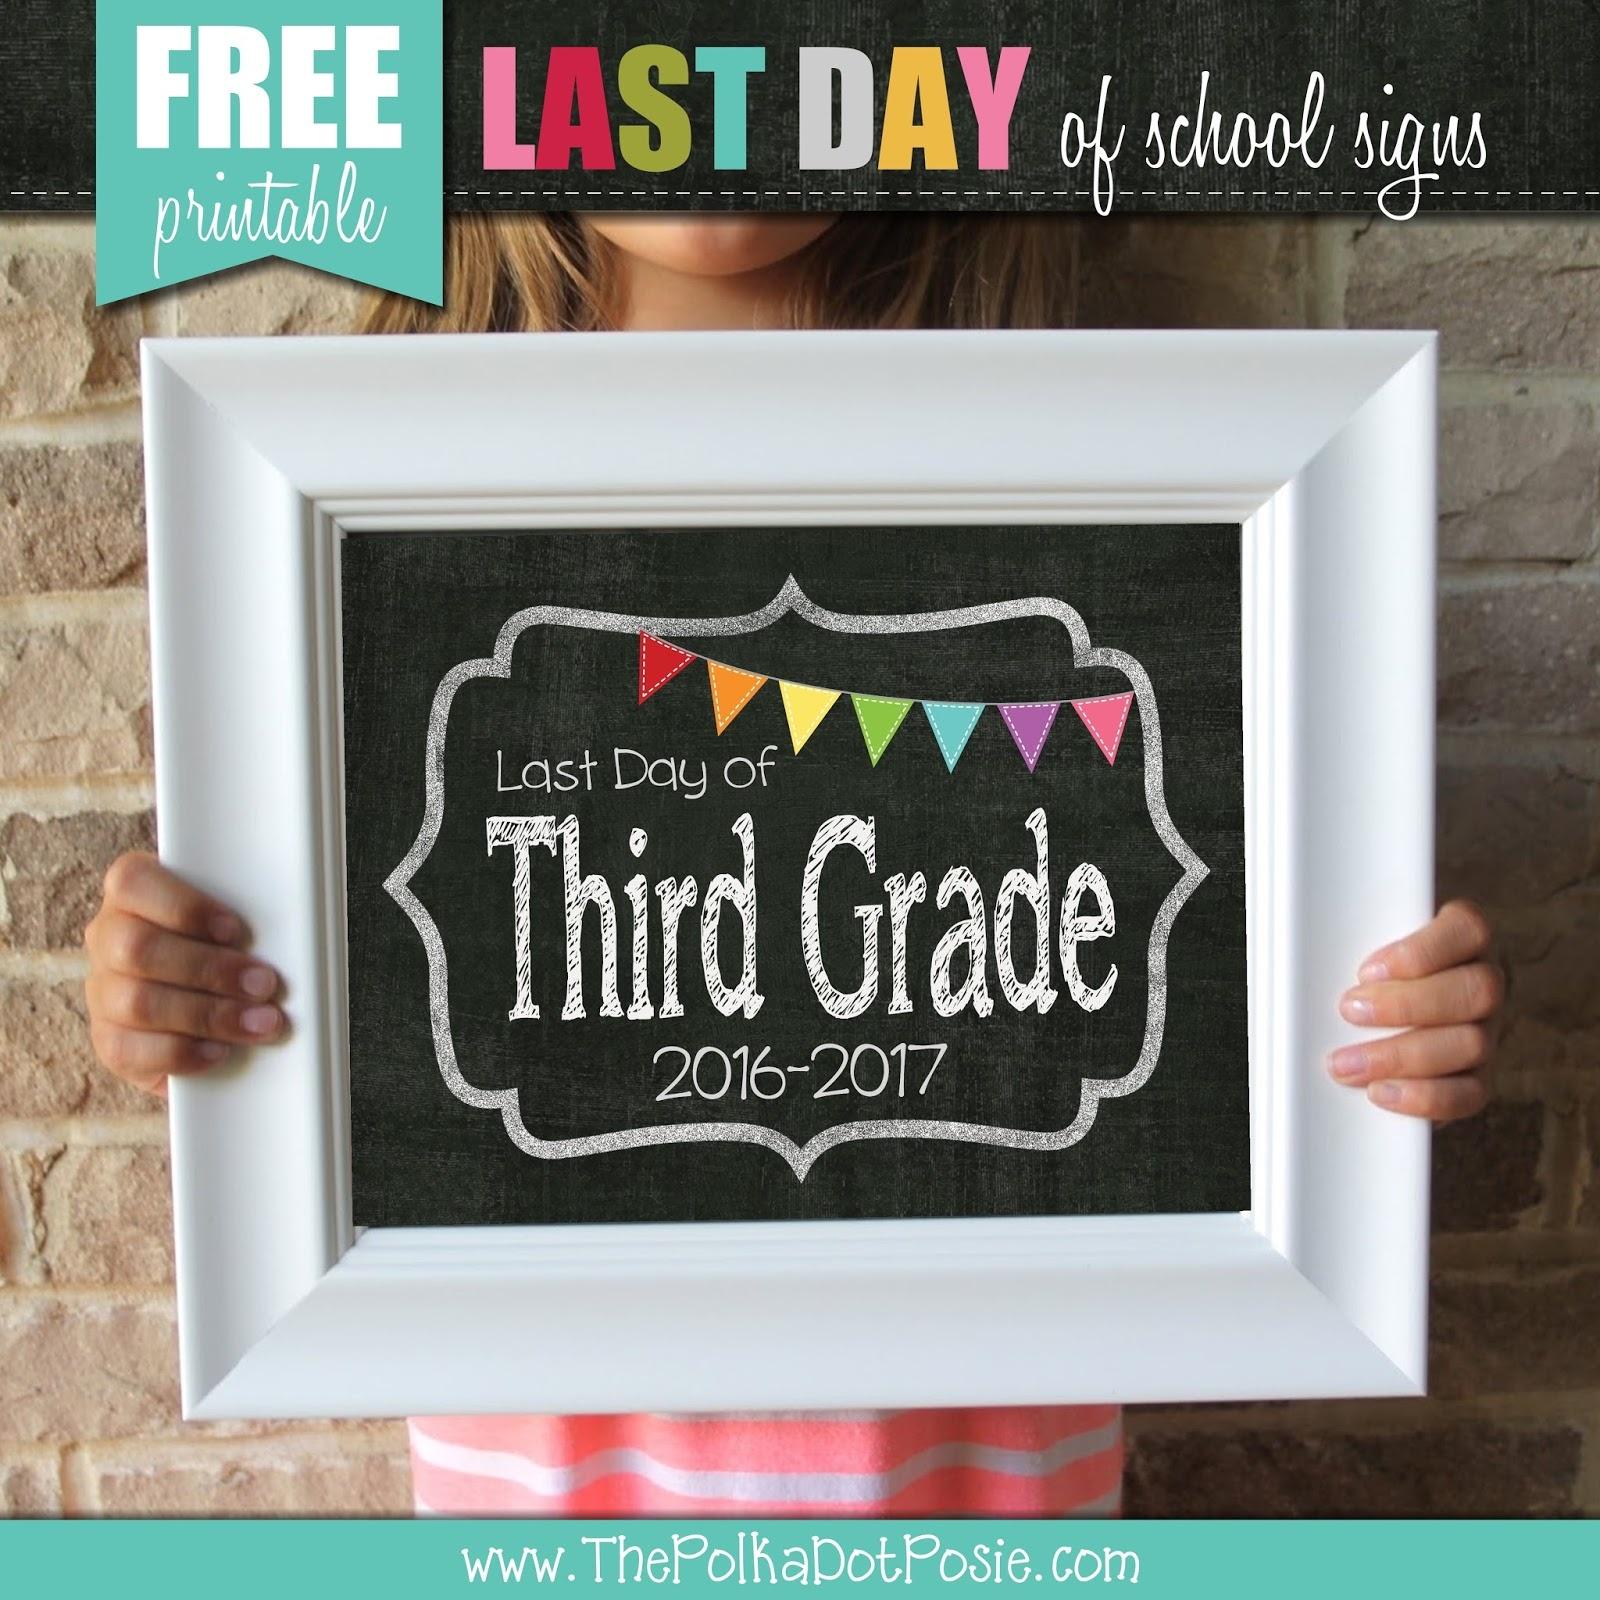 The Polka Dot Posie: Free Printable Last Day Of School Signs! - Free Printable First Day Of School Signs 2017 2018